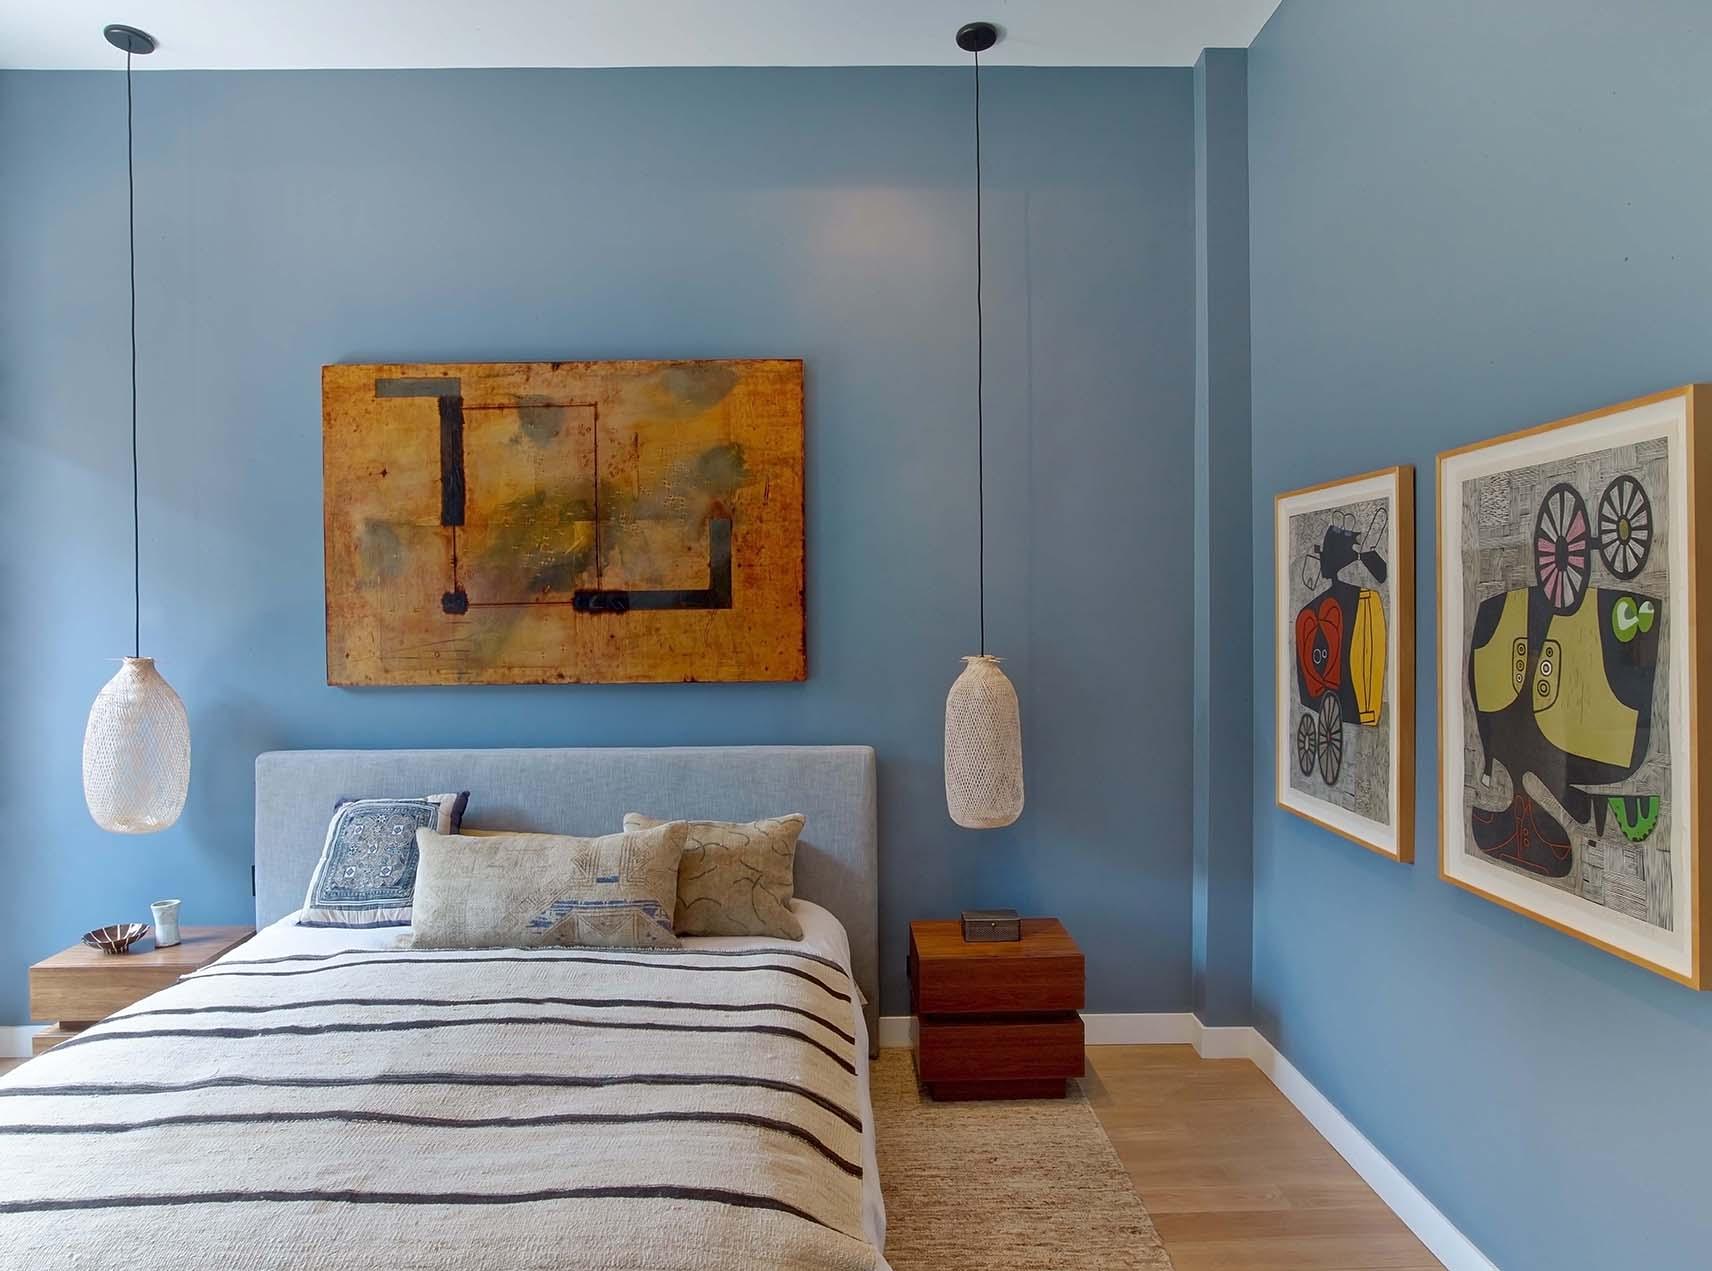 Flat Iron Loft Bedroom